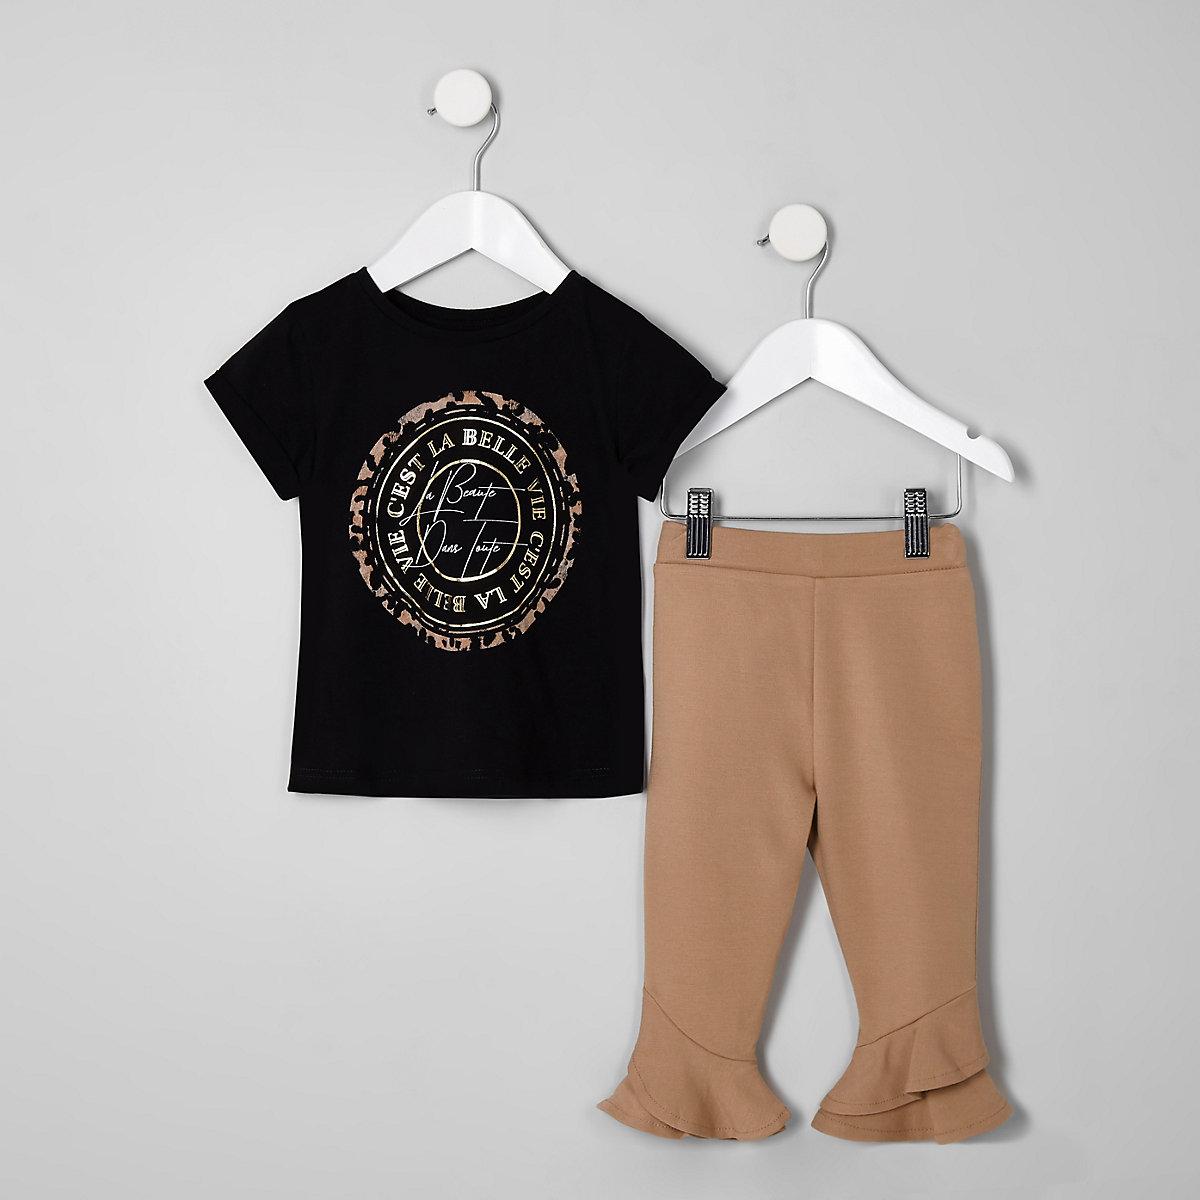 Mini girls black 'La beaute' T-shirt outfit